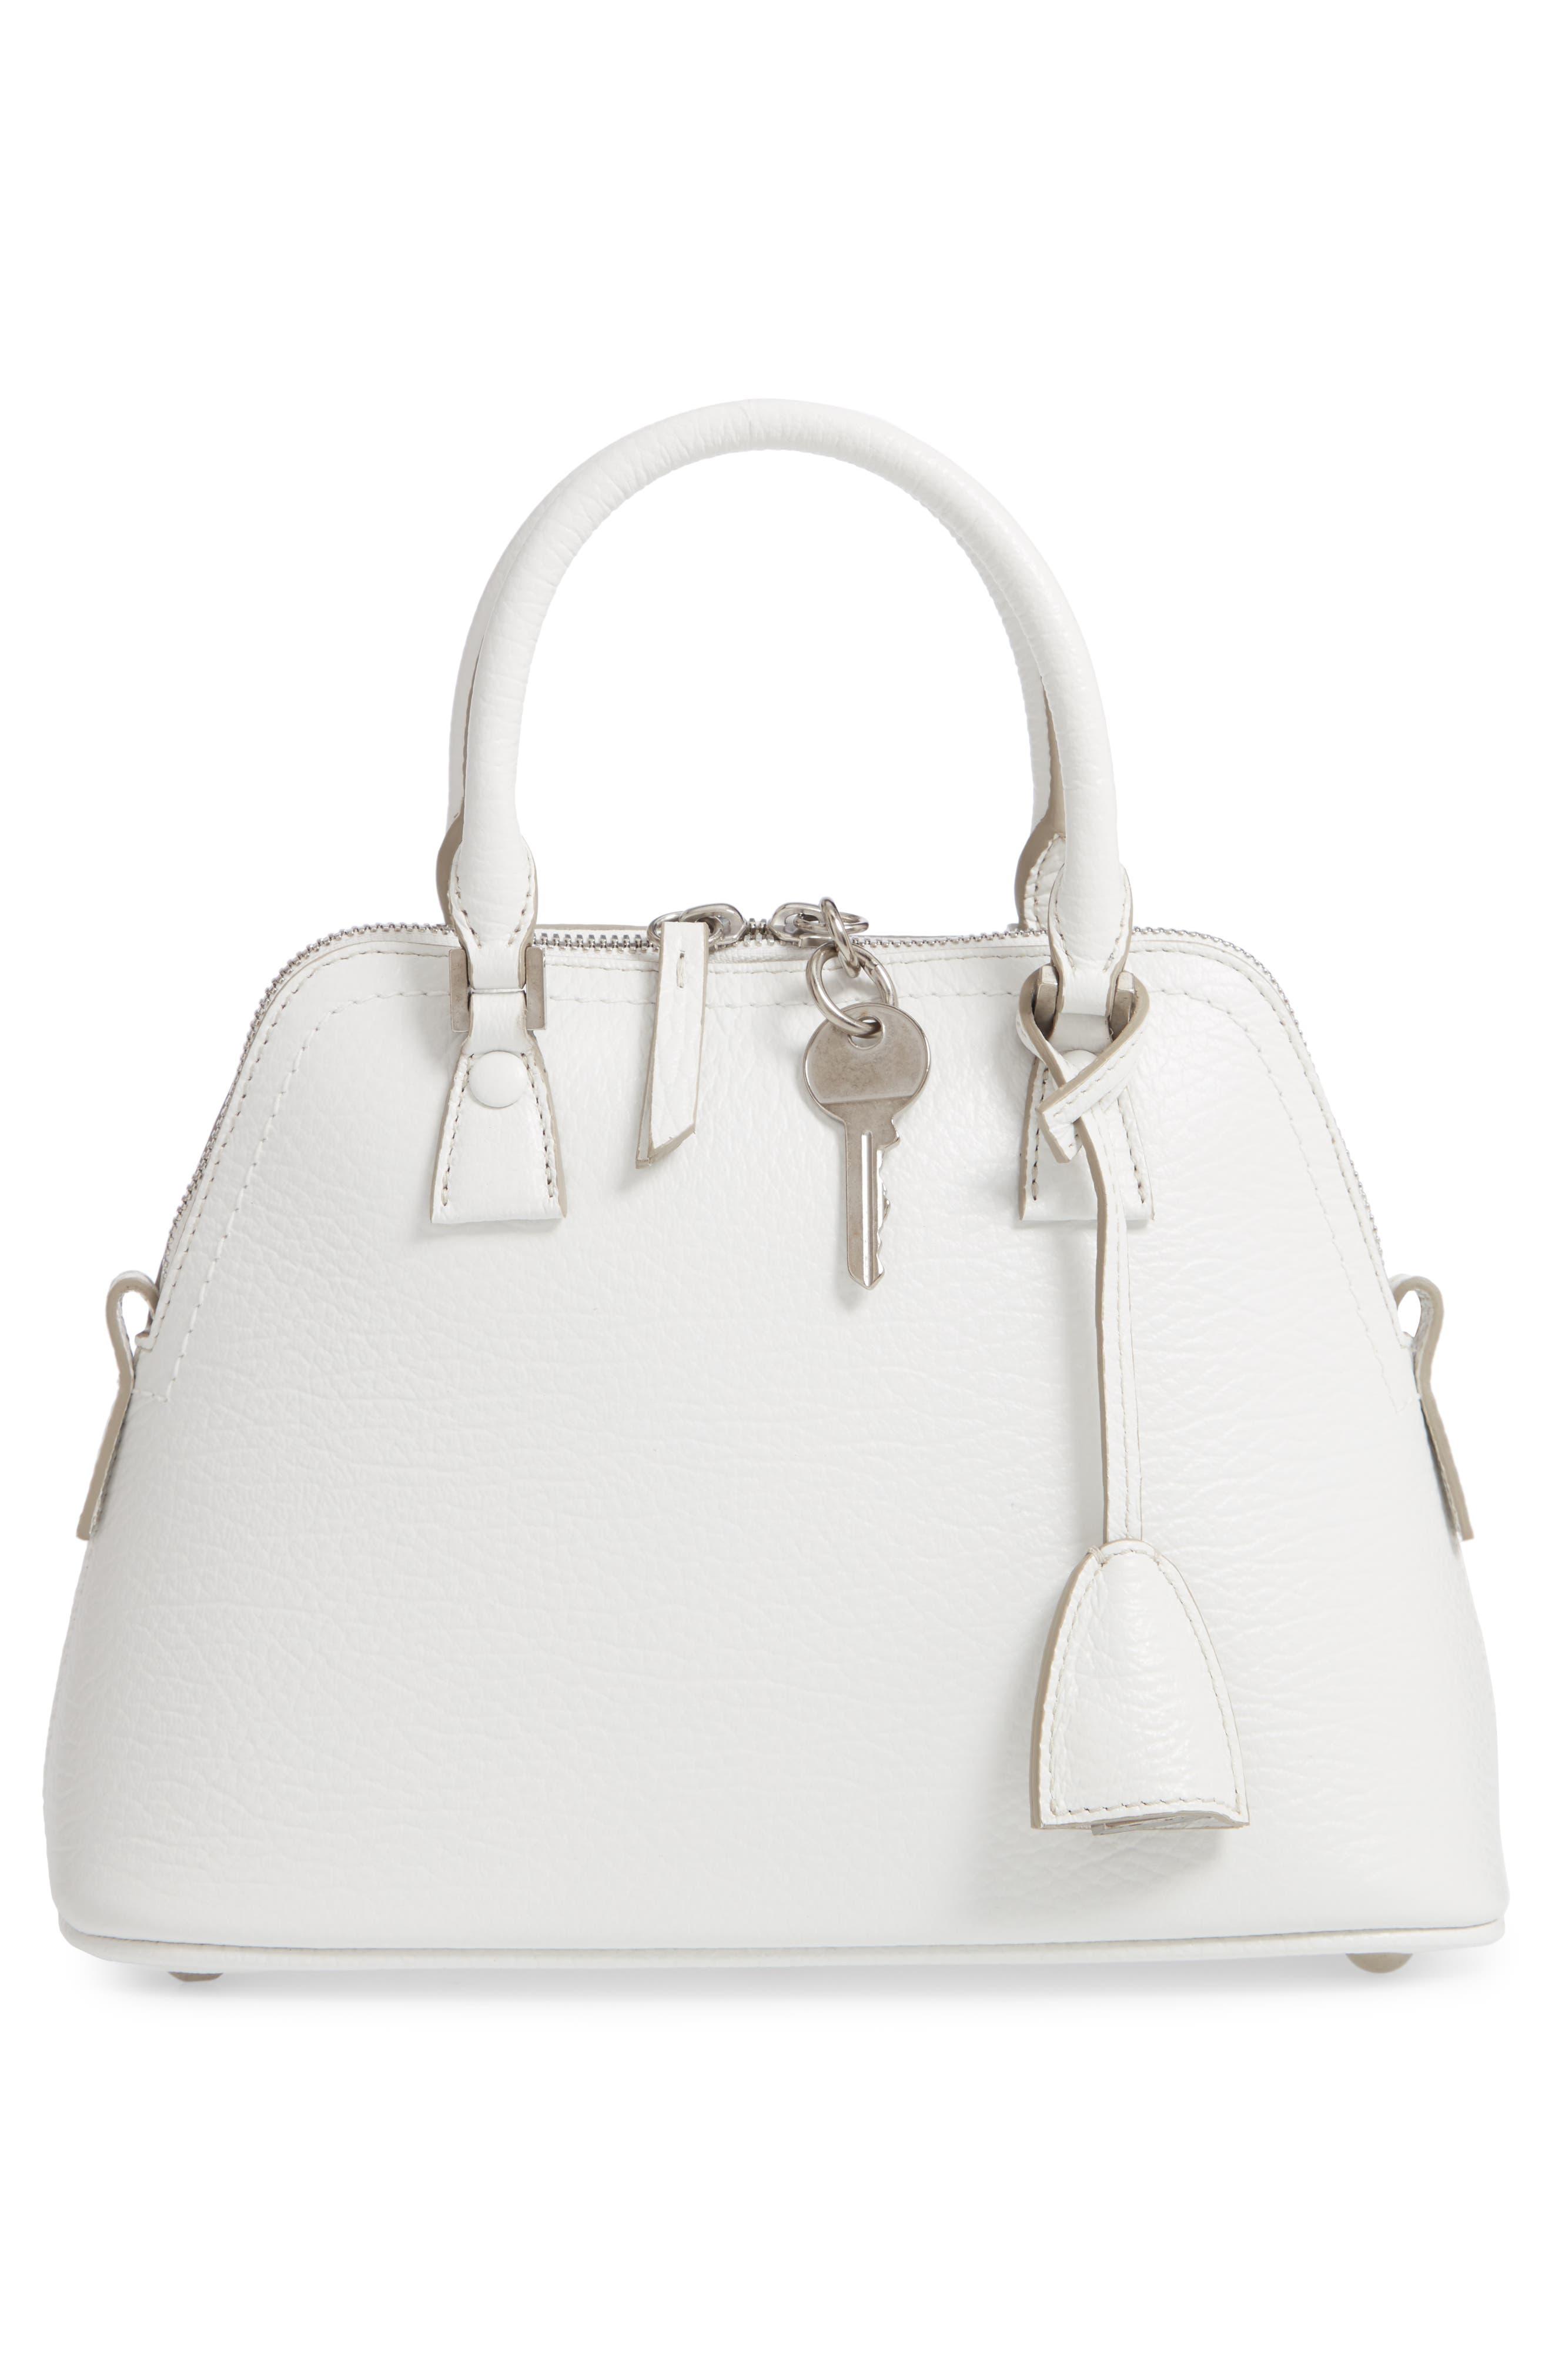 Small 5AC Calfskin Leather Handbag,                             Alternate thumbnail 3, color,                             WHITE